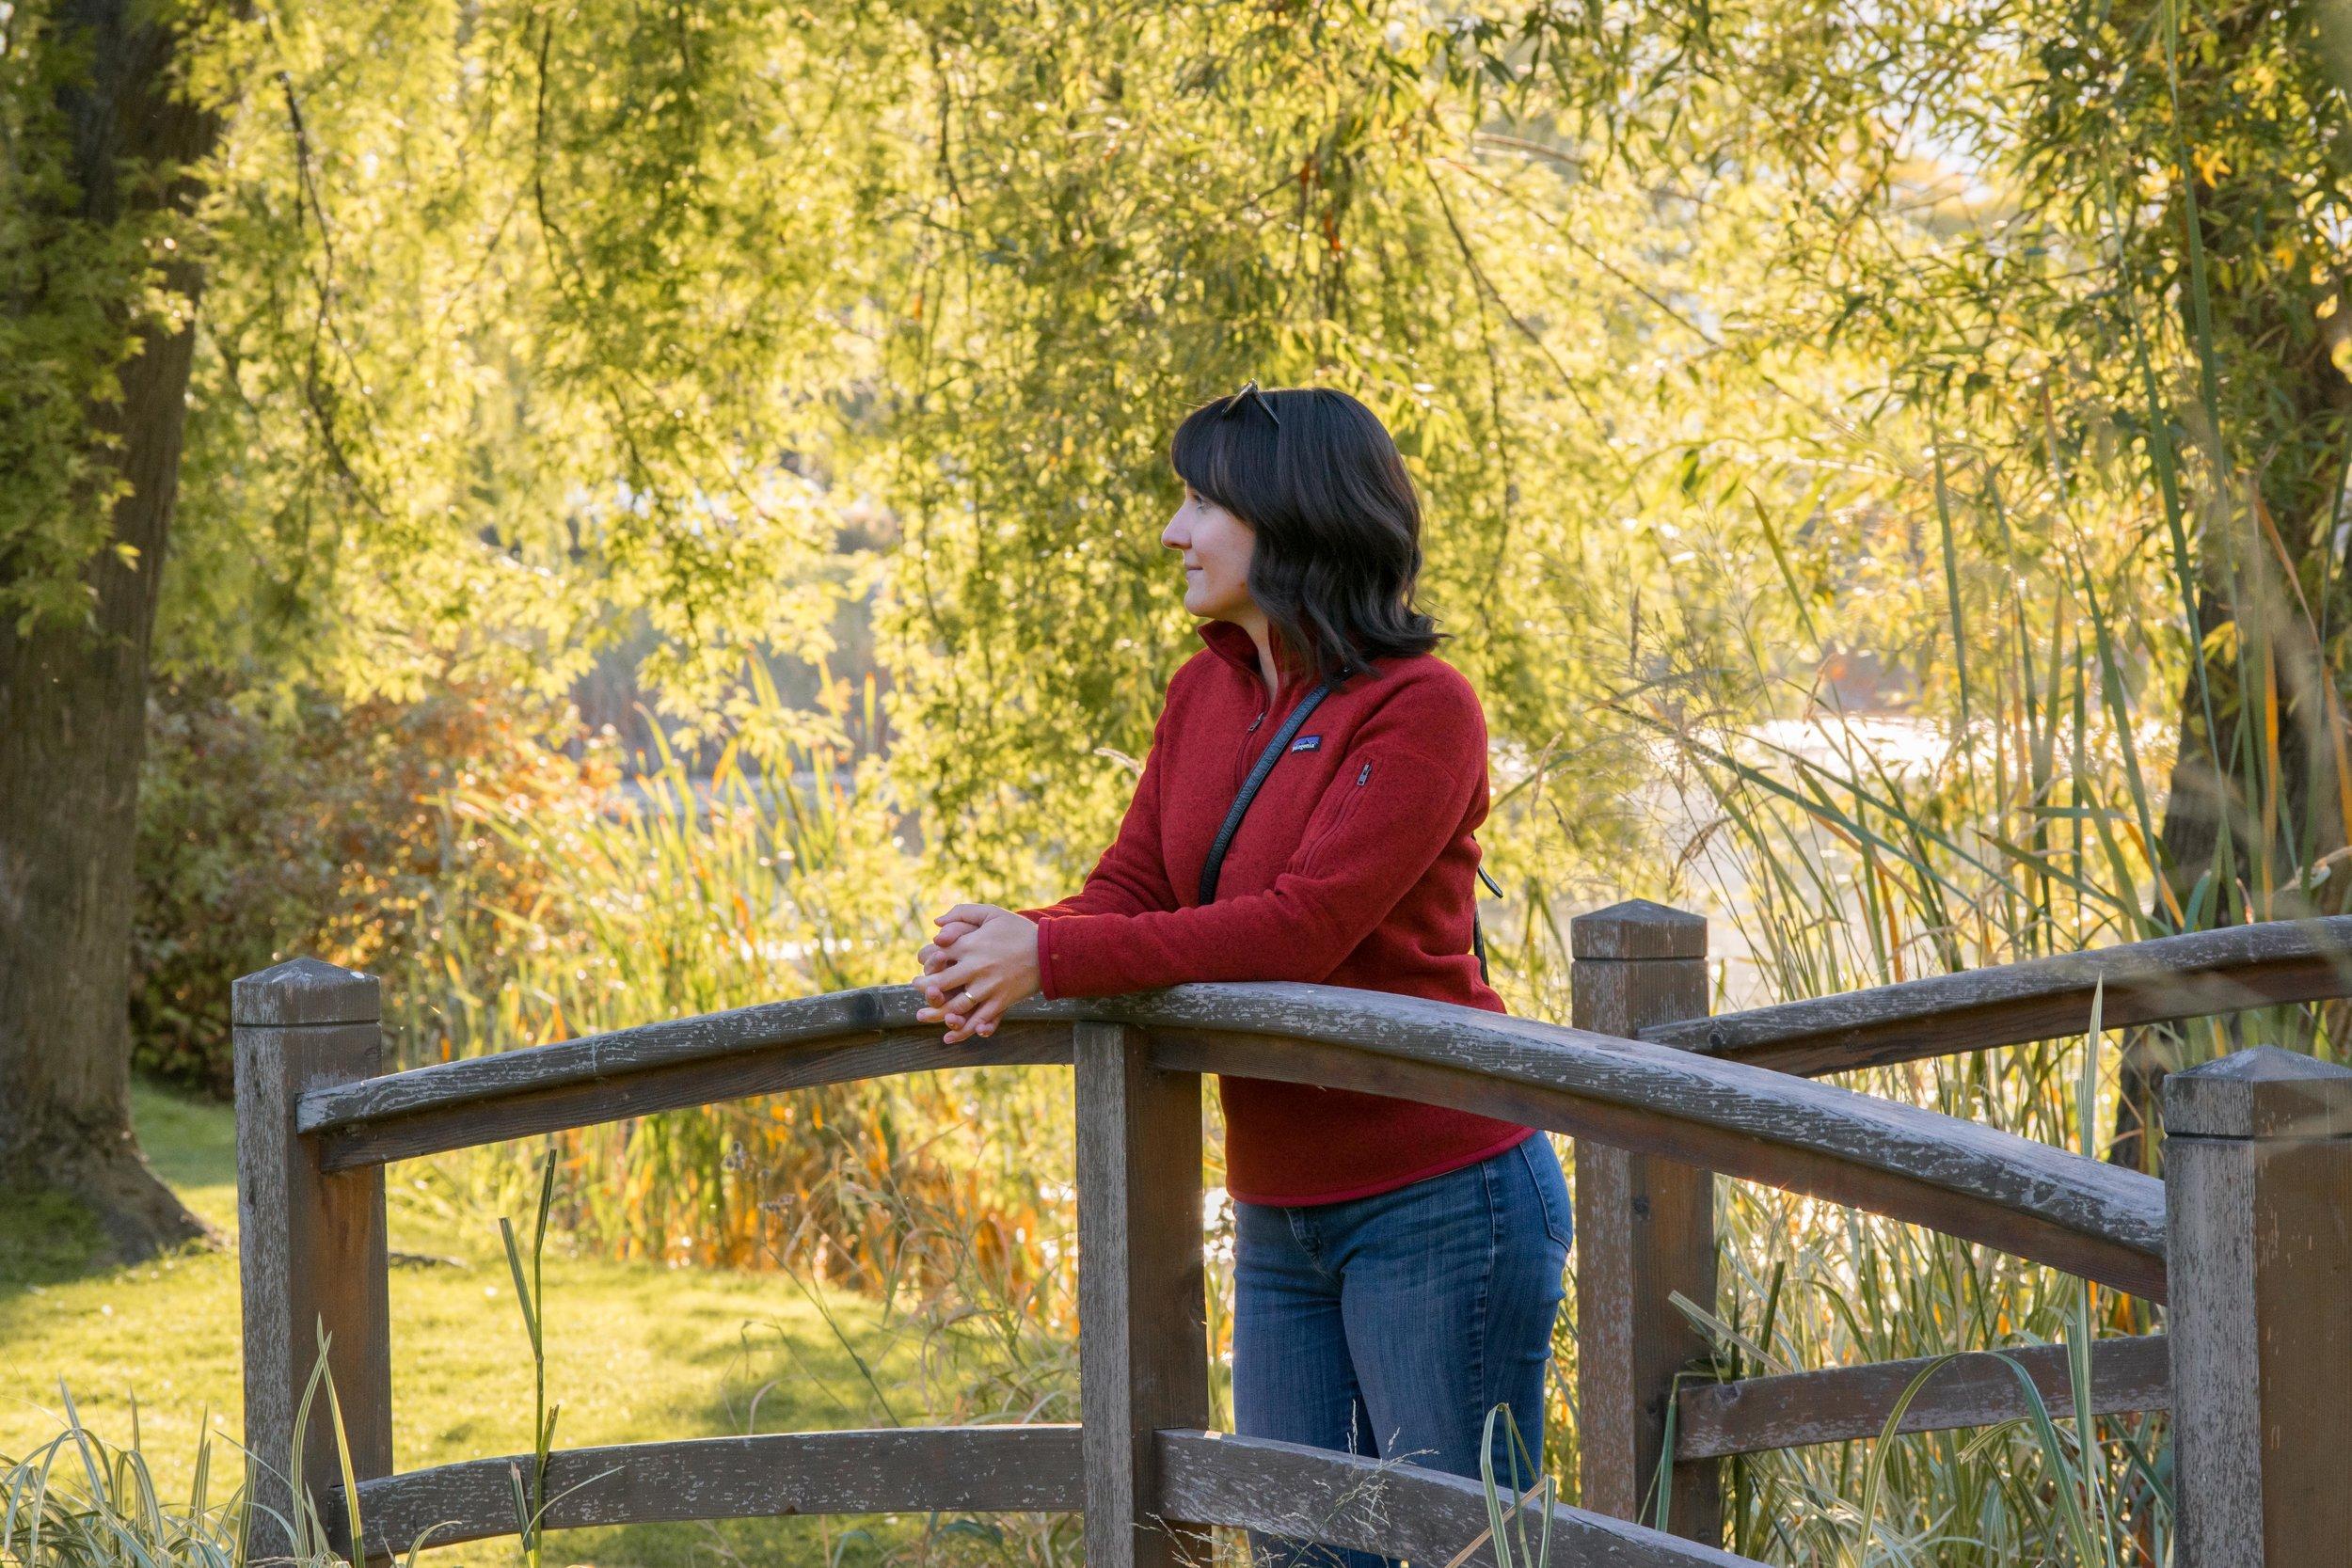 Bridge in McGuire Lake Park in Salmon Arm